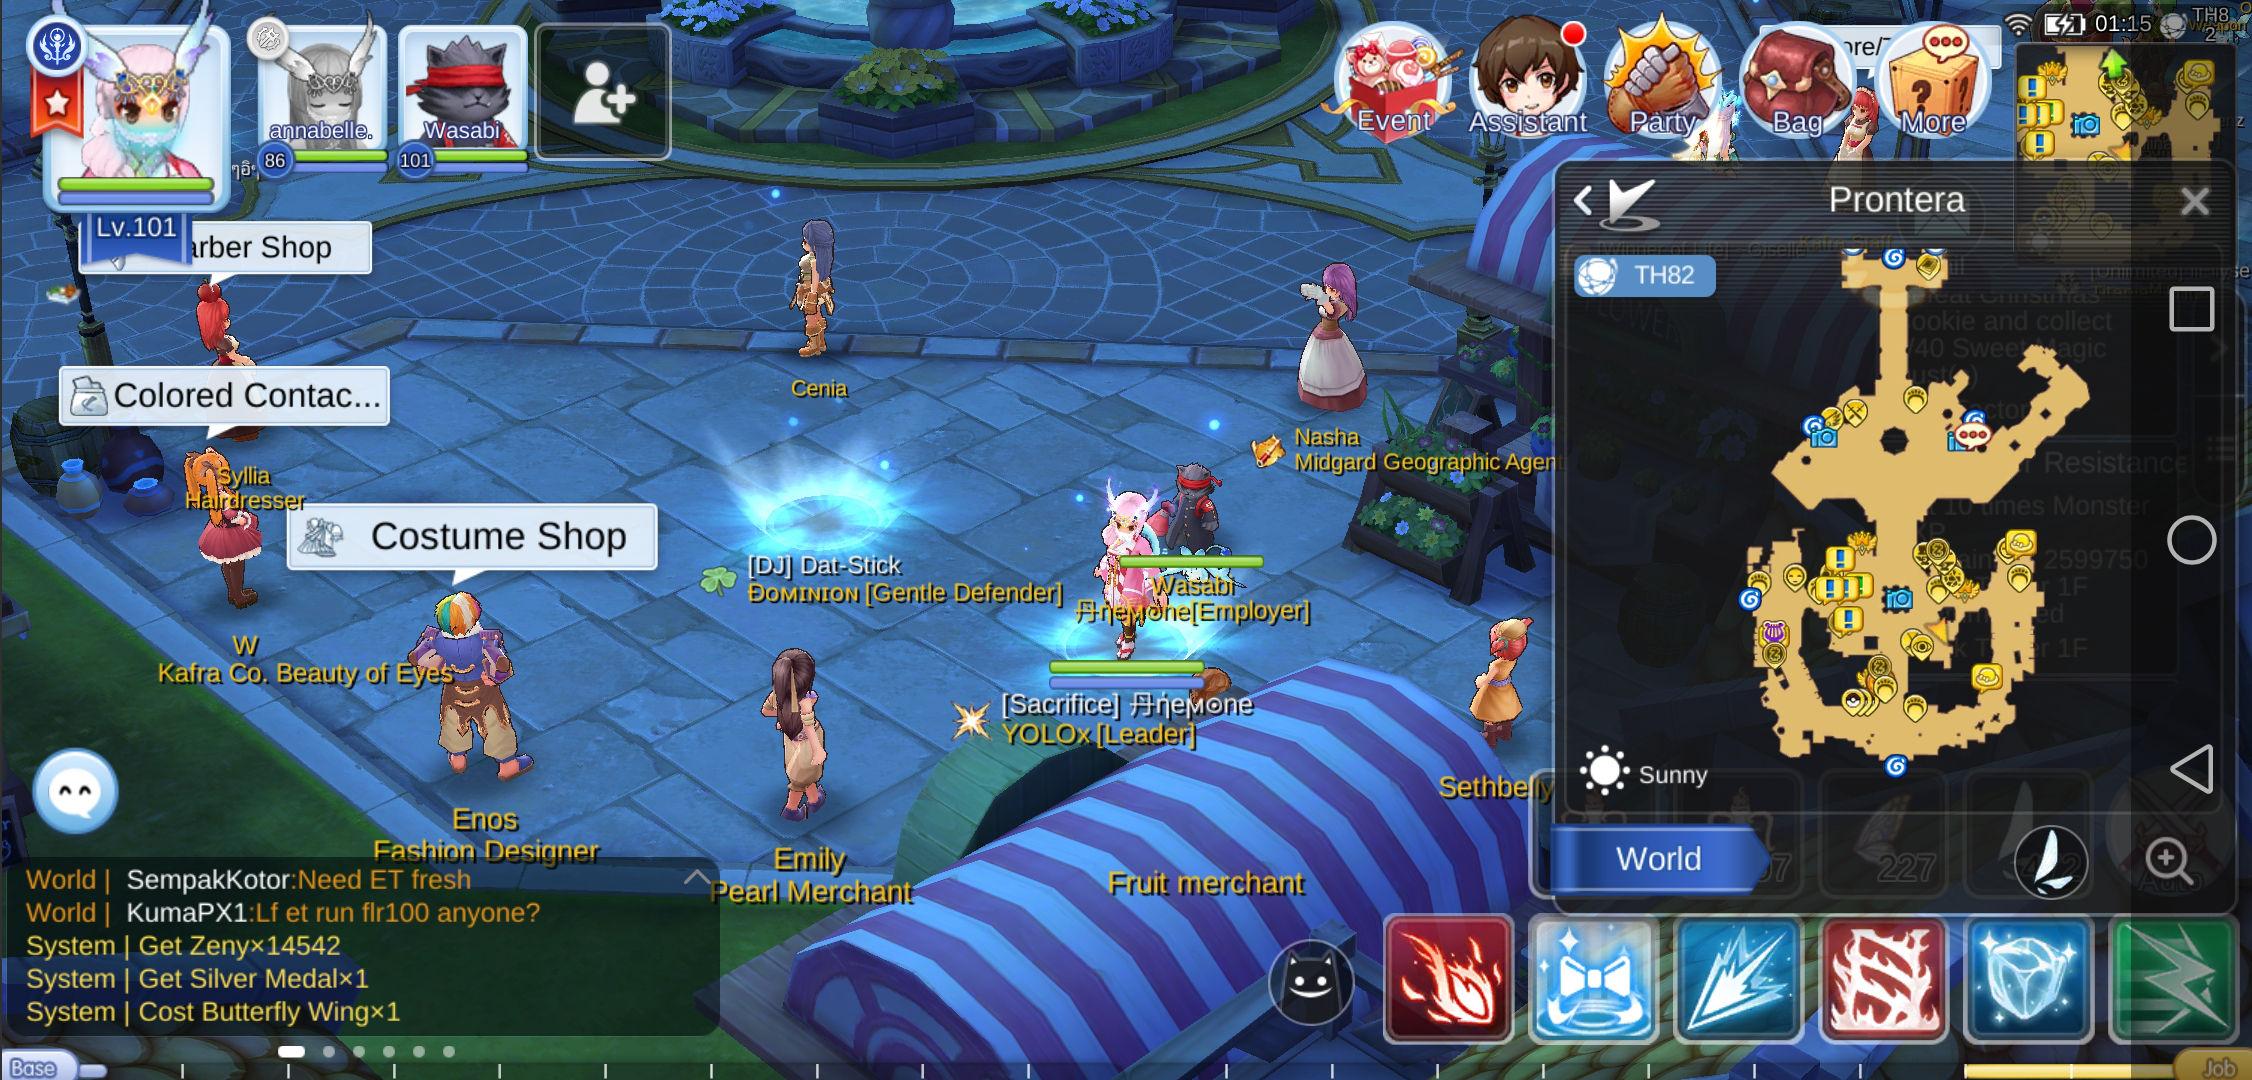 Fruit Merchant Prontera NPC Location Level 99 Aura Ragnarok Mobile